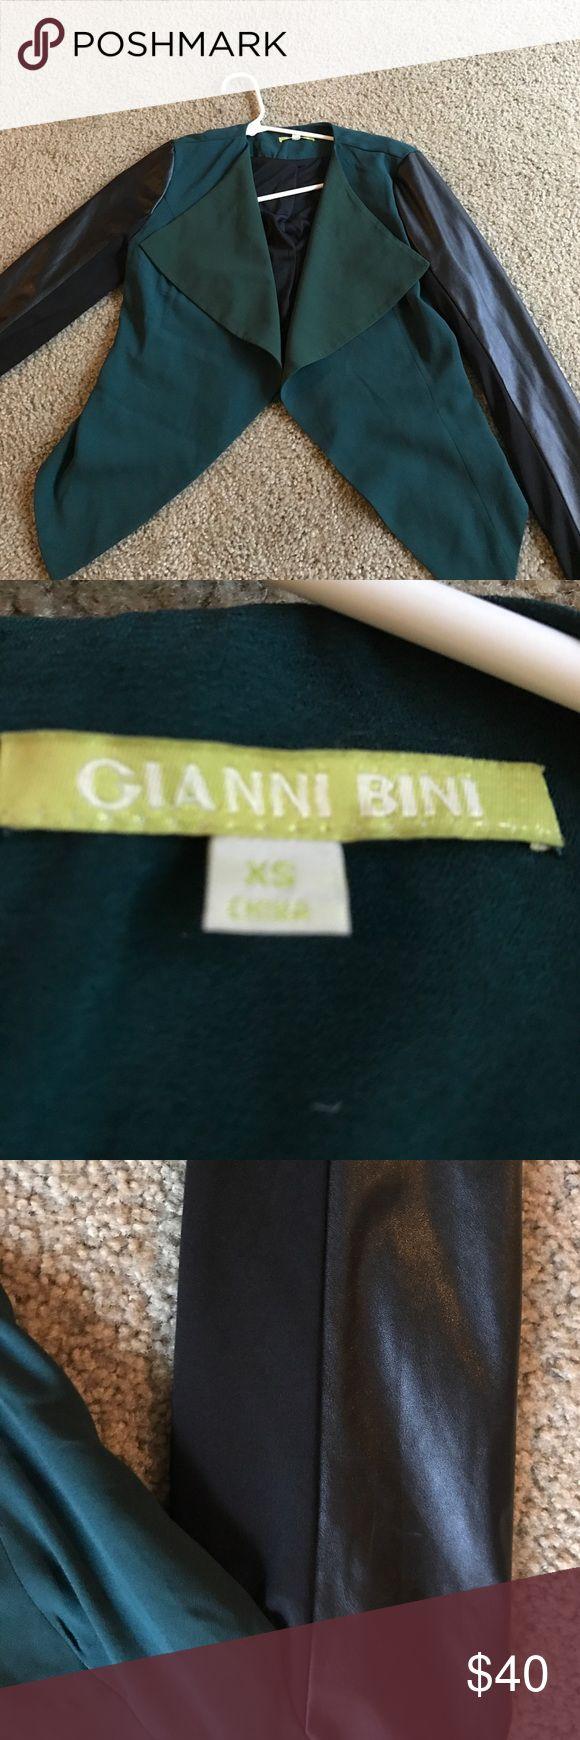 A Gianni Bini Blazer A green Gianni Bini Blazer with pleather detailed sleeves. Size XS Gianni Bini  Jackets & Coats Blazers